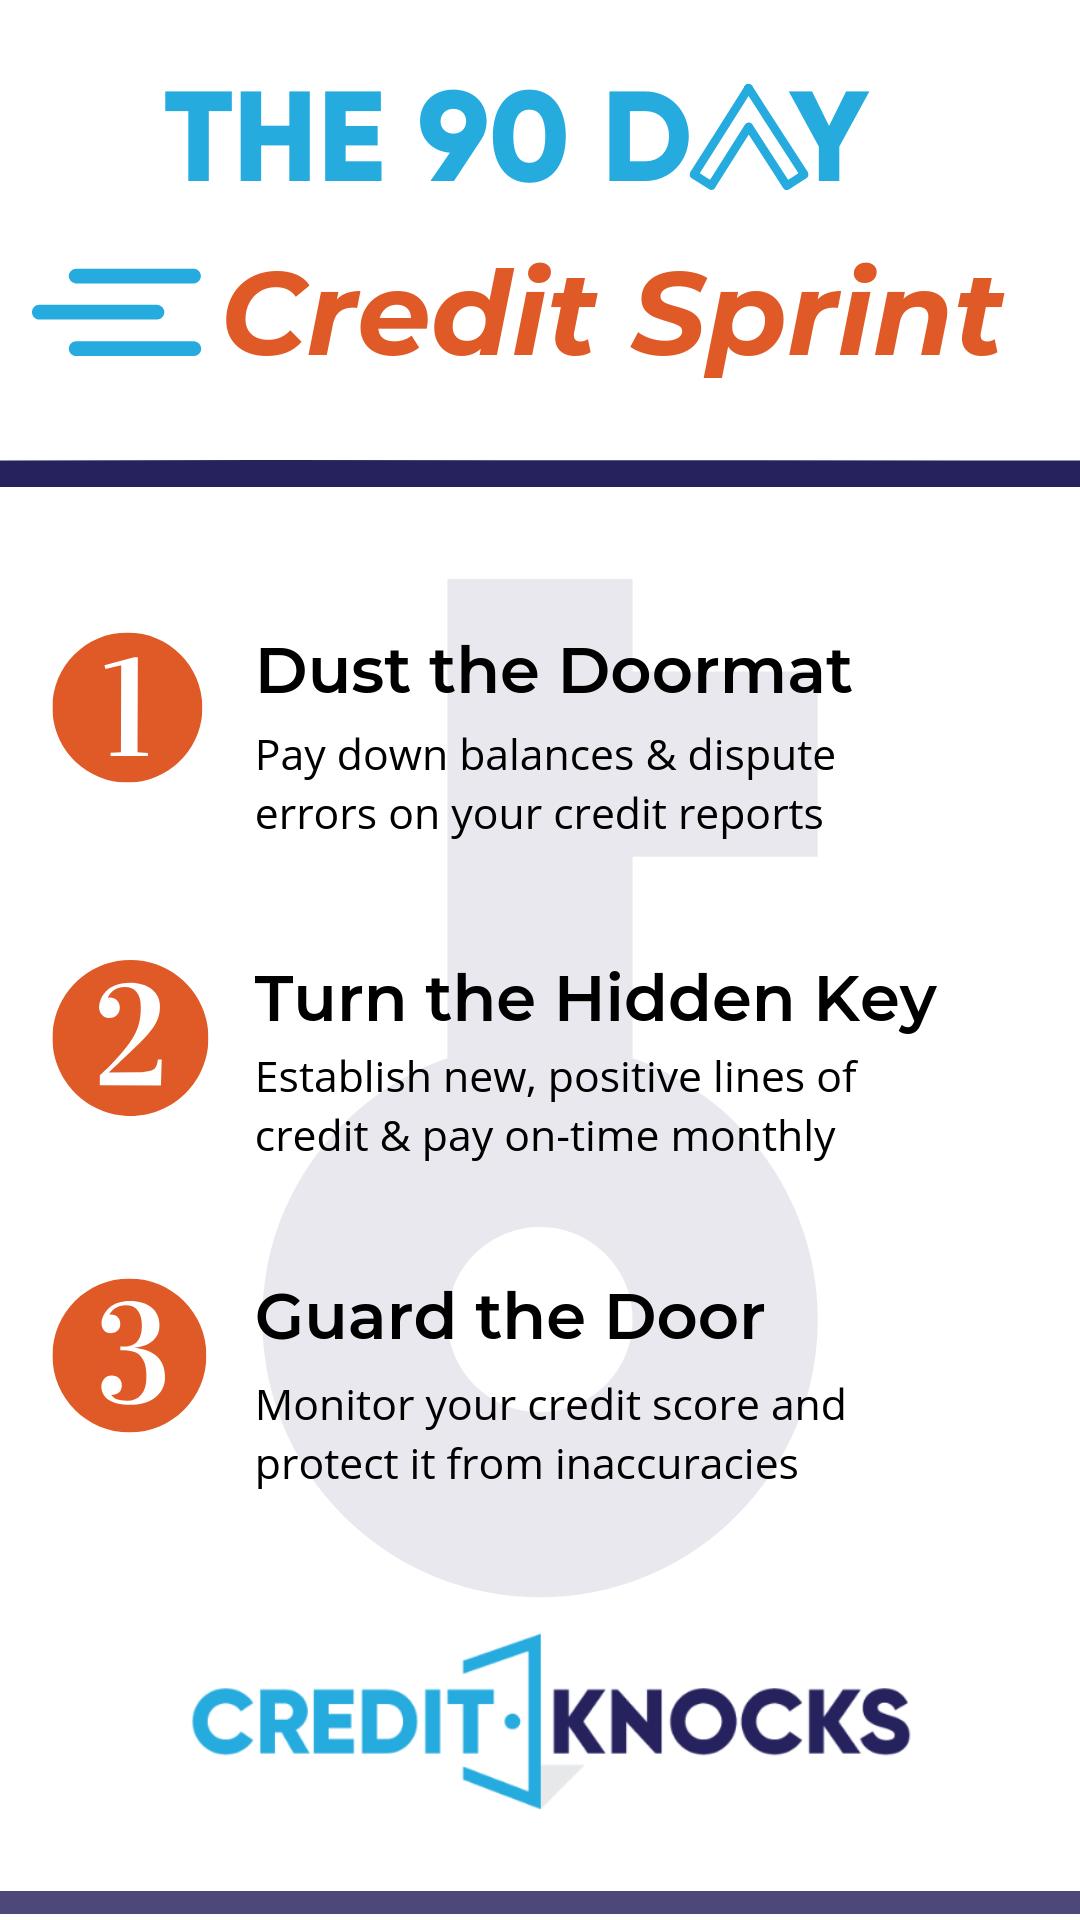 90 Day Credit Sprint Steps for Bad Credit